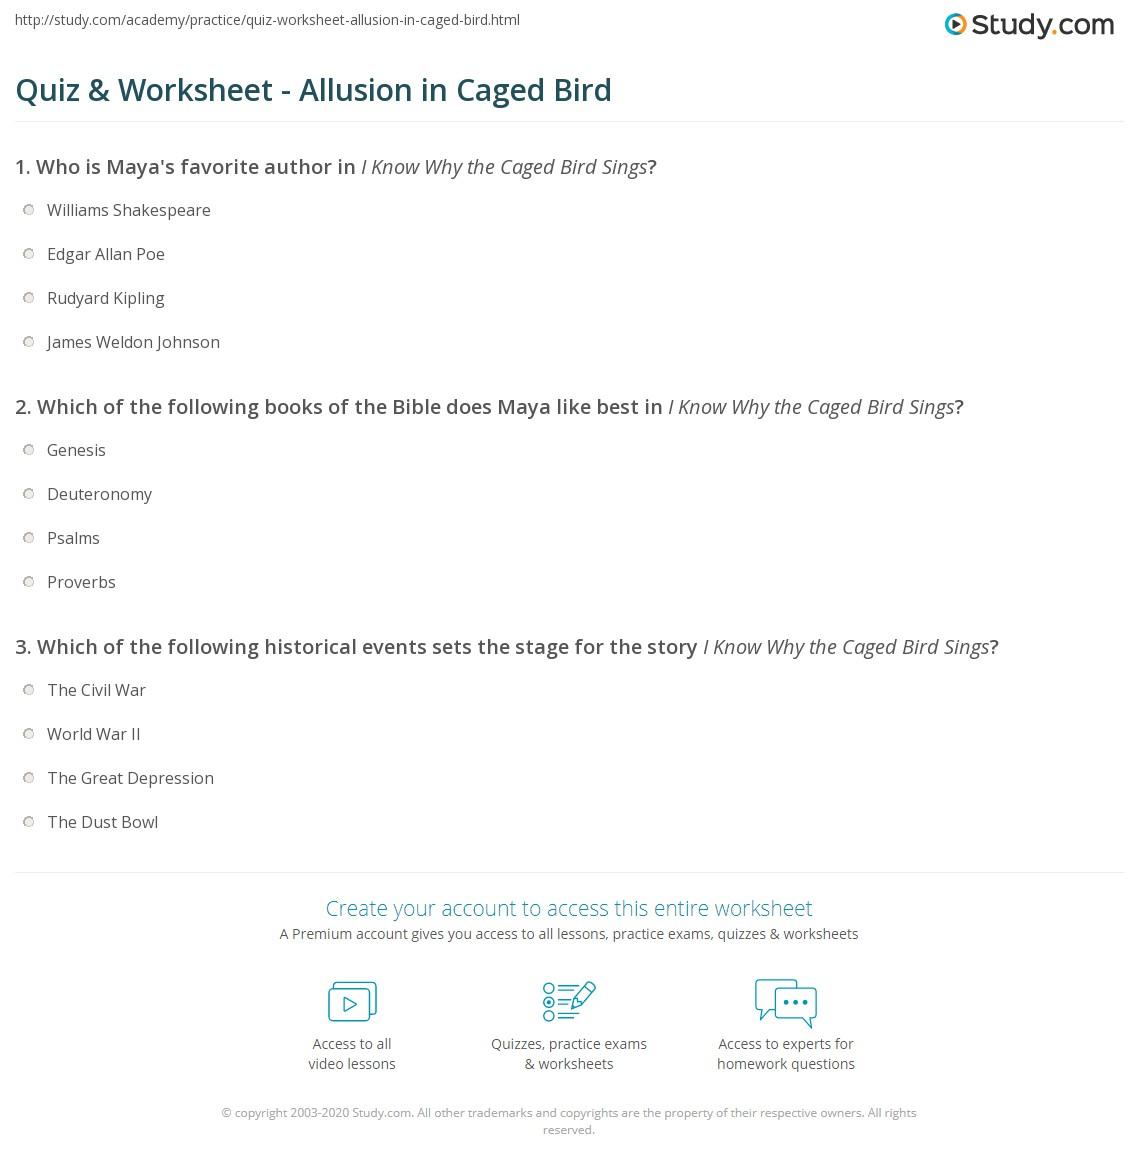 quiz worksheet allusion in caged bird. Black Bedroom Furniture Sets. Home Design Ideas